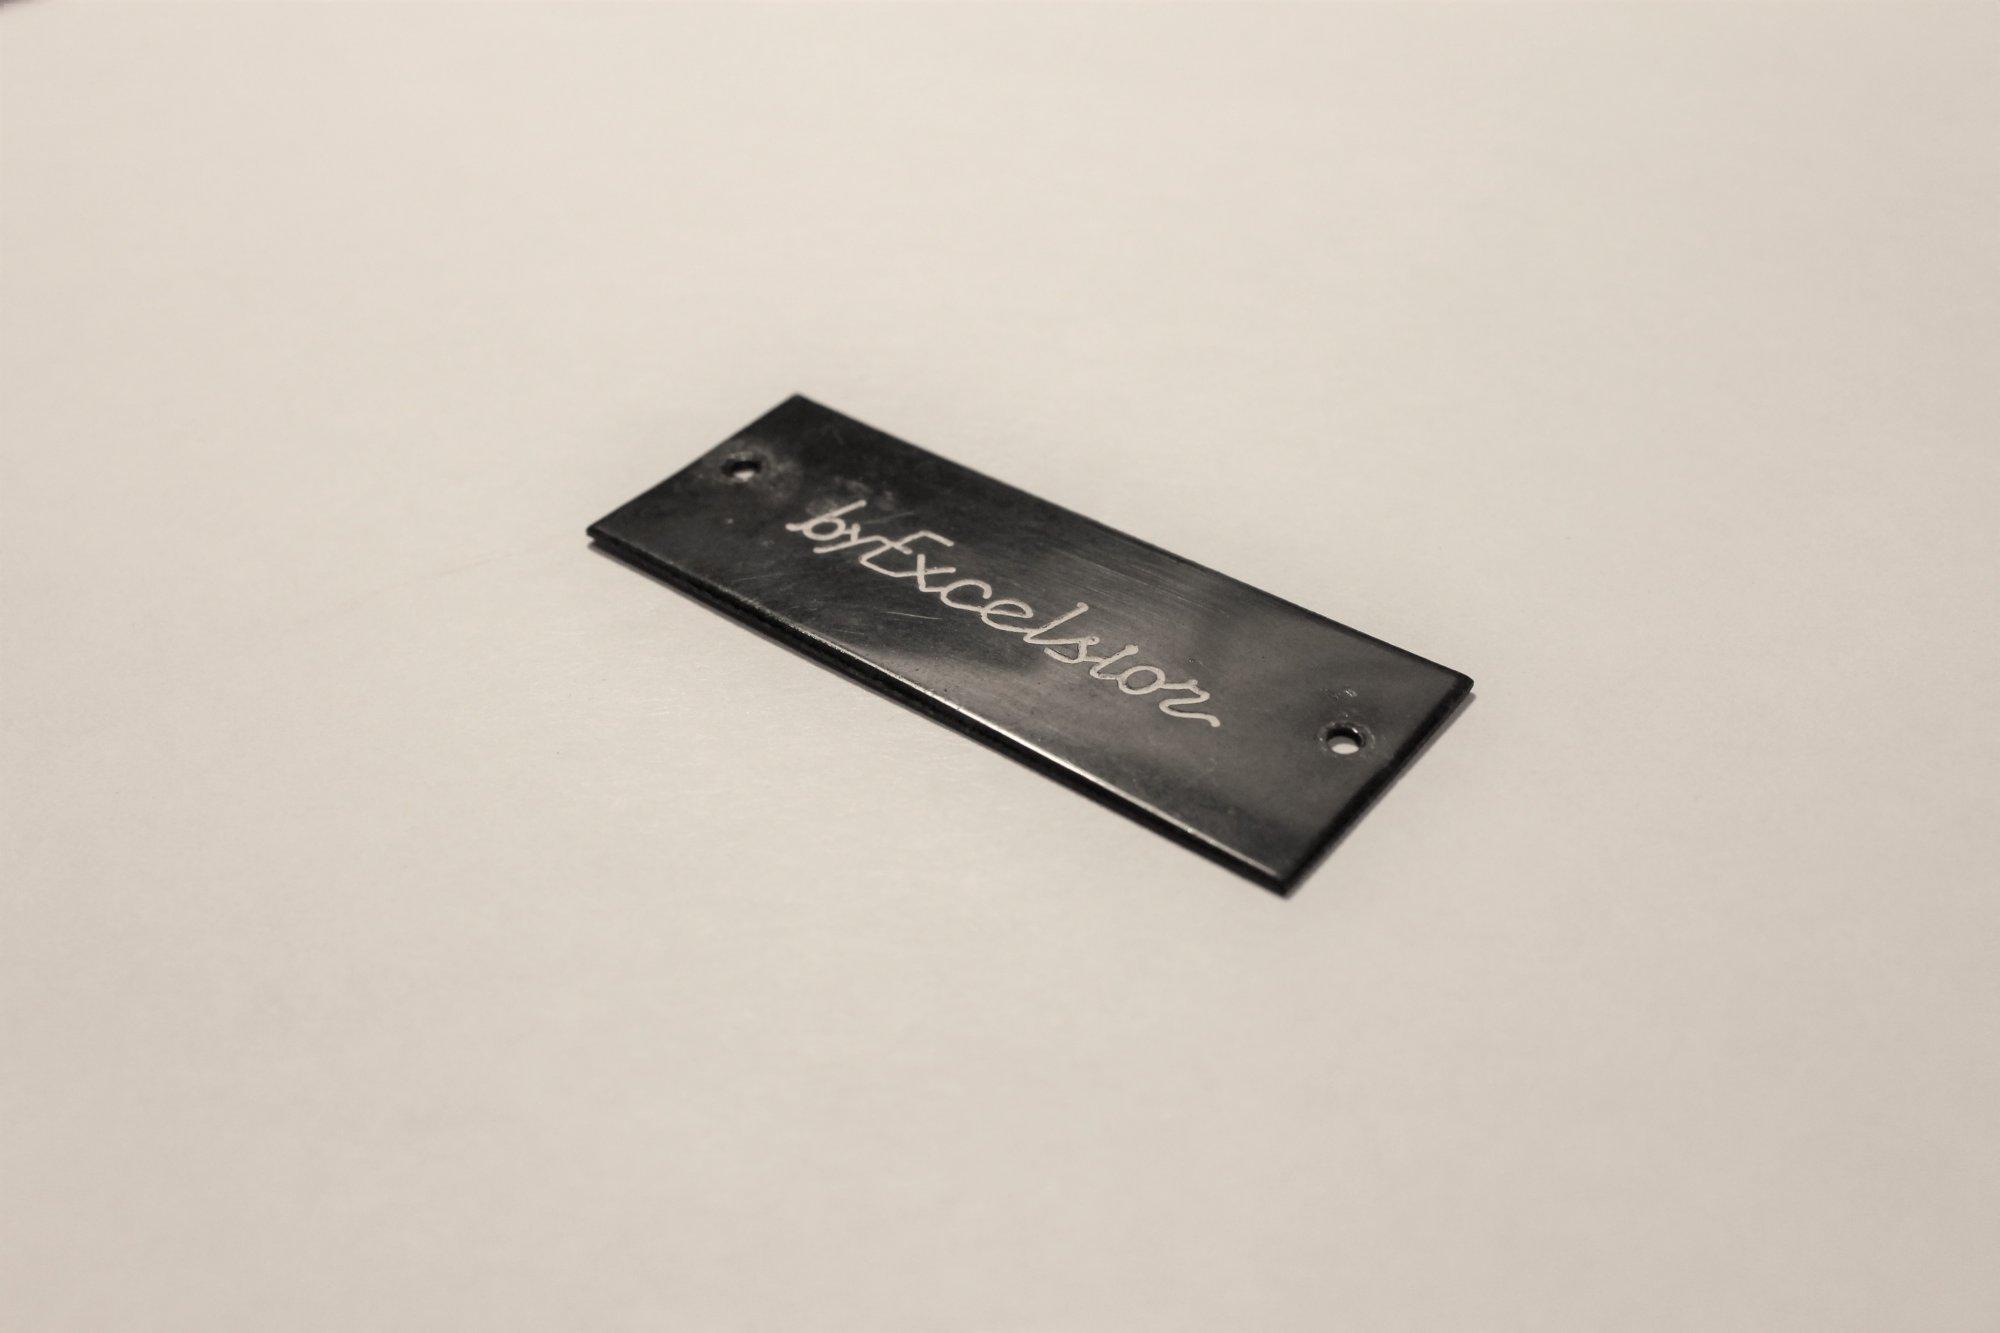 Accordion Part - by Excelsior Black Horizontal Logo Emblem